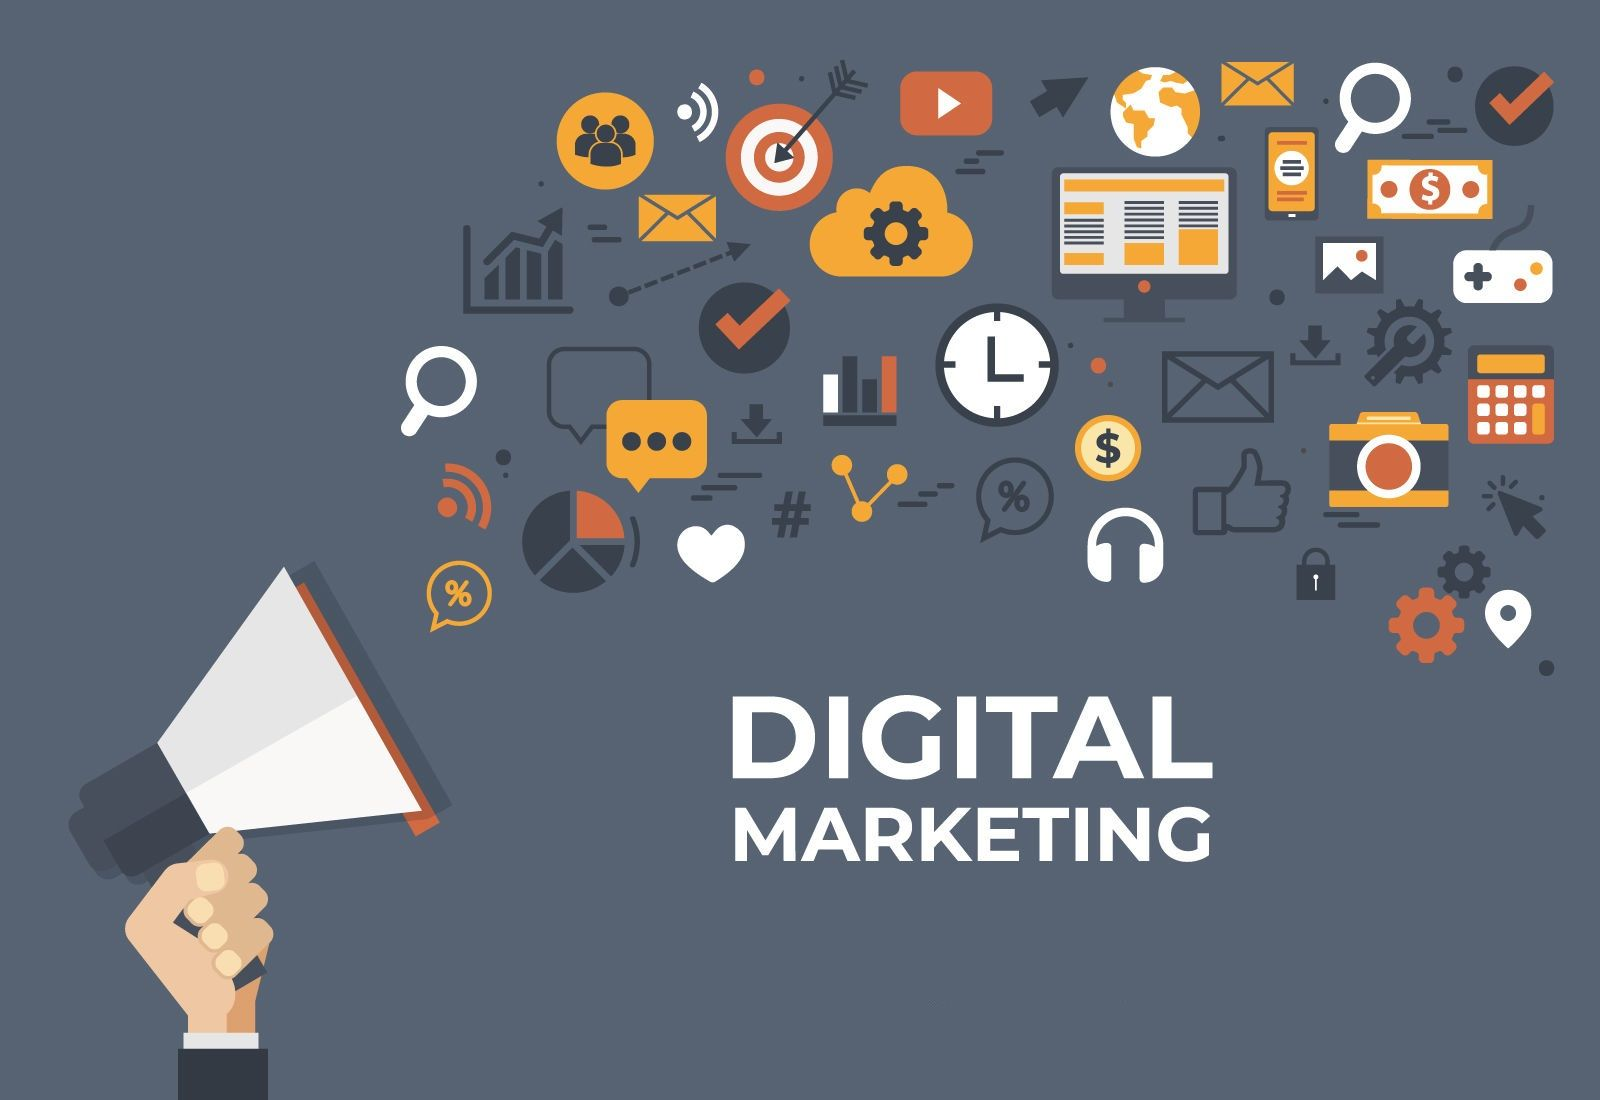 Top Digital Marketing Agency Uae Digital Business Card Digital Marketing Agency Digital Marketing Design